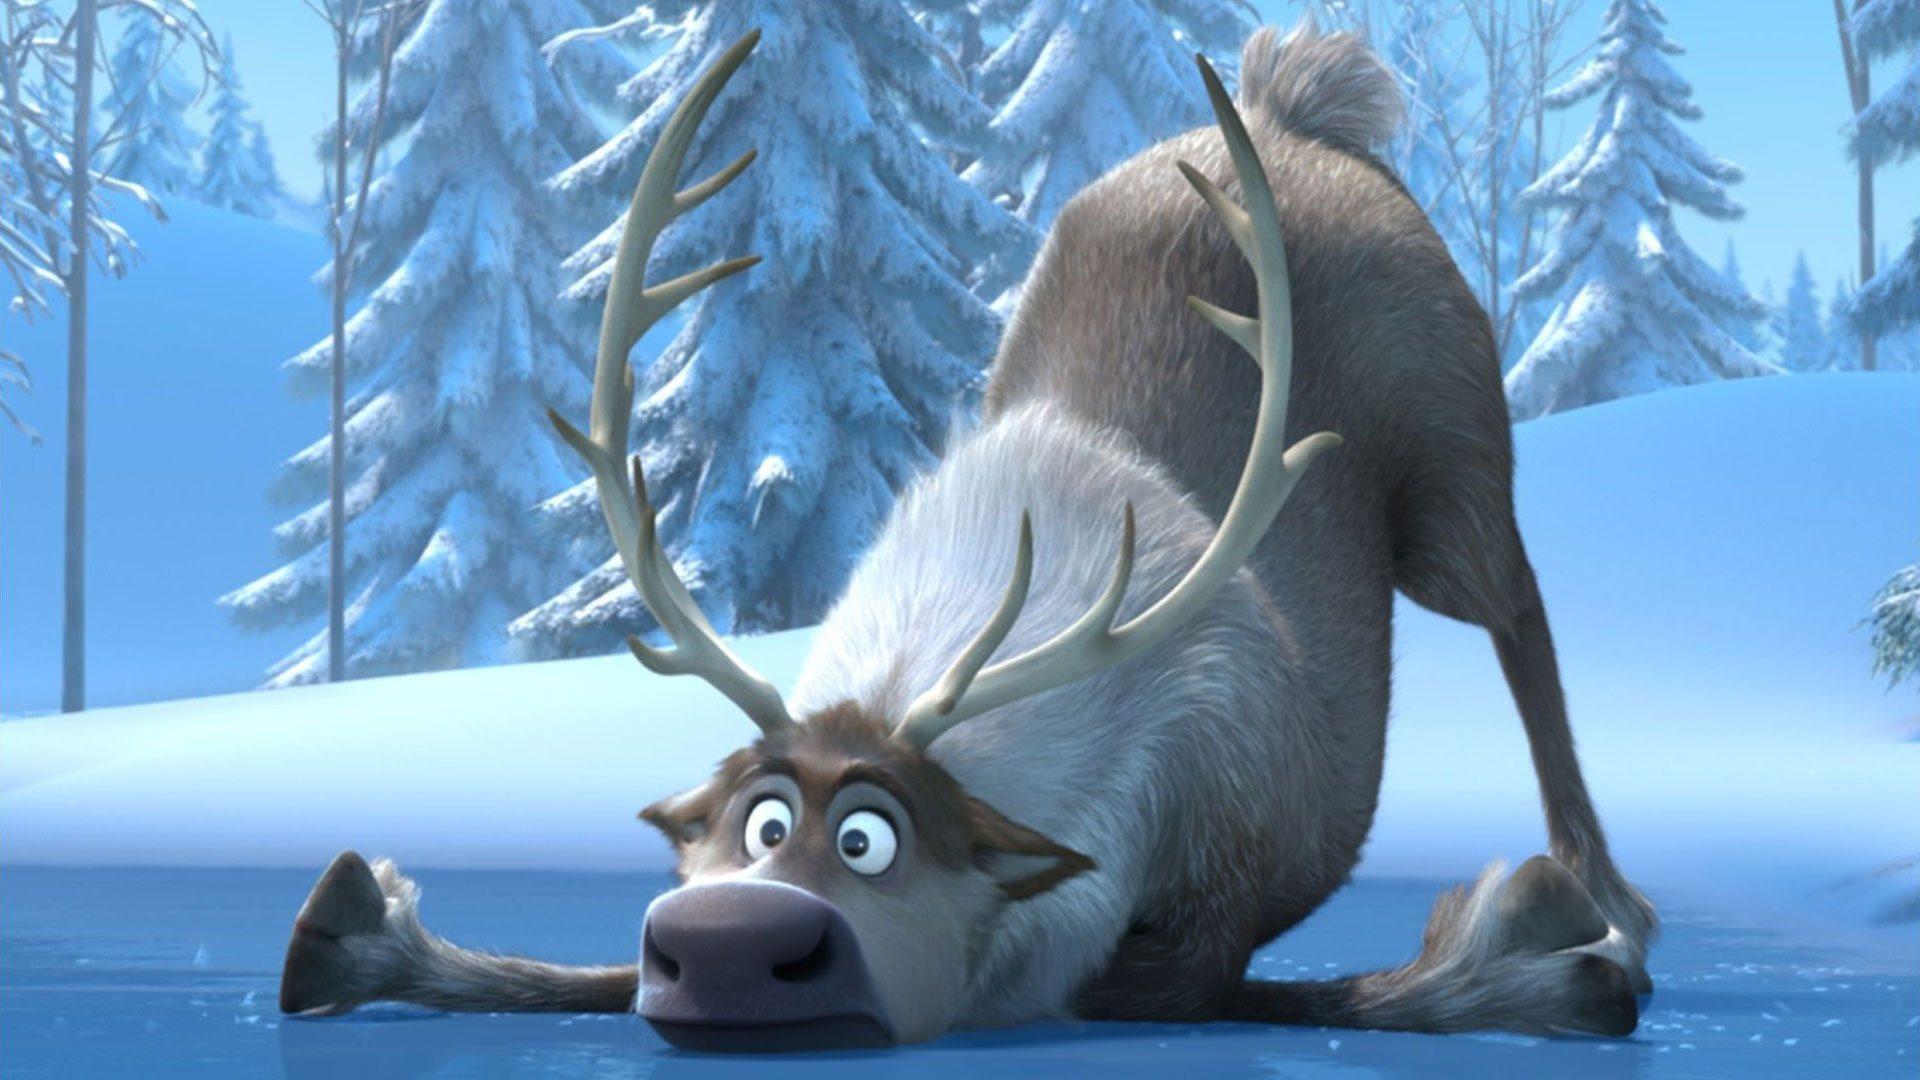 Snarcasm: Disney is Eating Pixar's Lunch